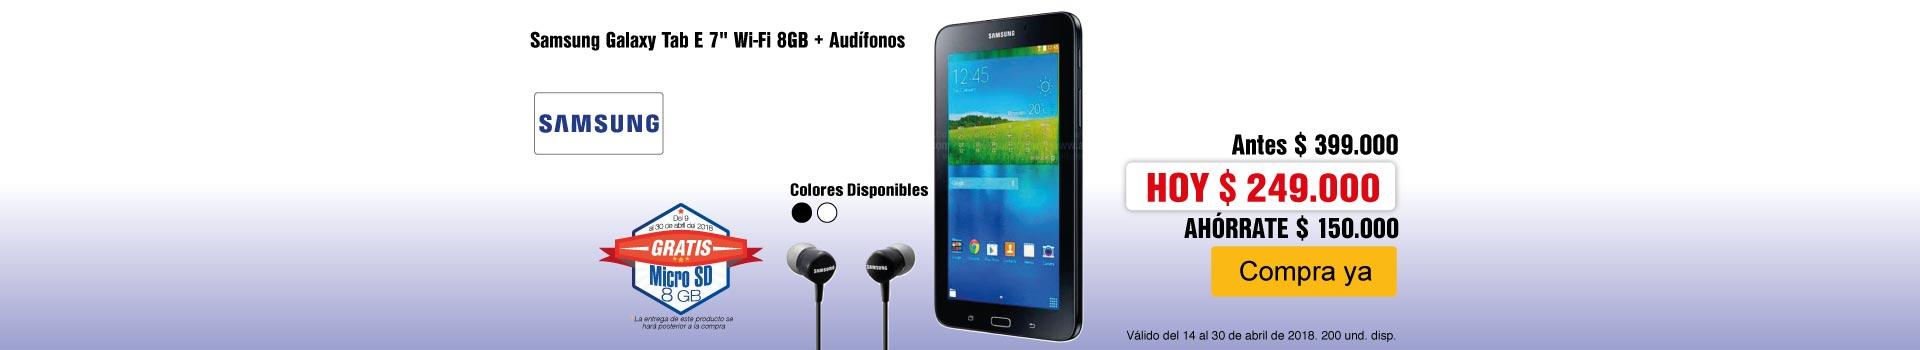 AK-KT-HIPER-2-computadores y tablets-PP---Samsung-Galaxy Tab E 7